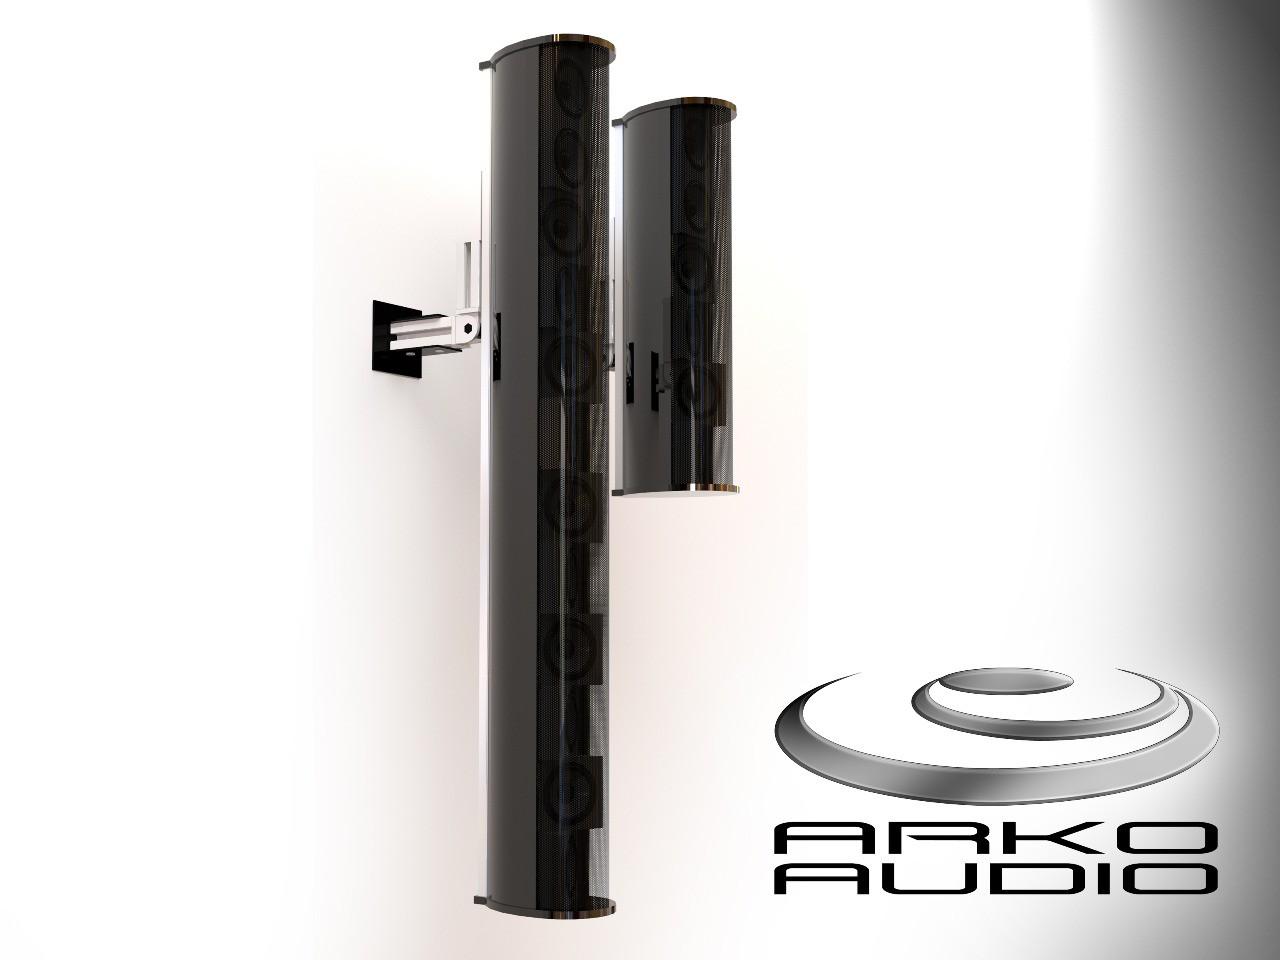 "Caixa Coluna Vertical Line Array Passiva 800Watts - 12x3"" Polegadas - Vla1203P - Arko Audio"